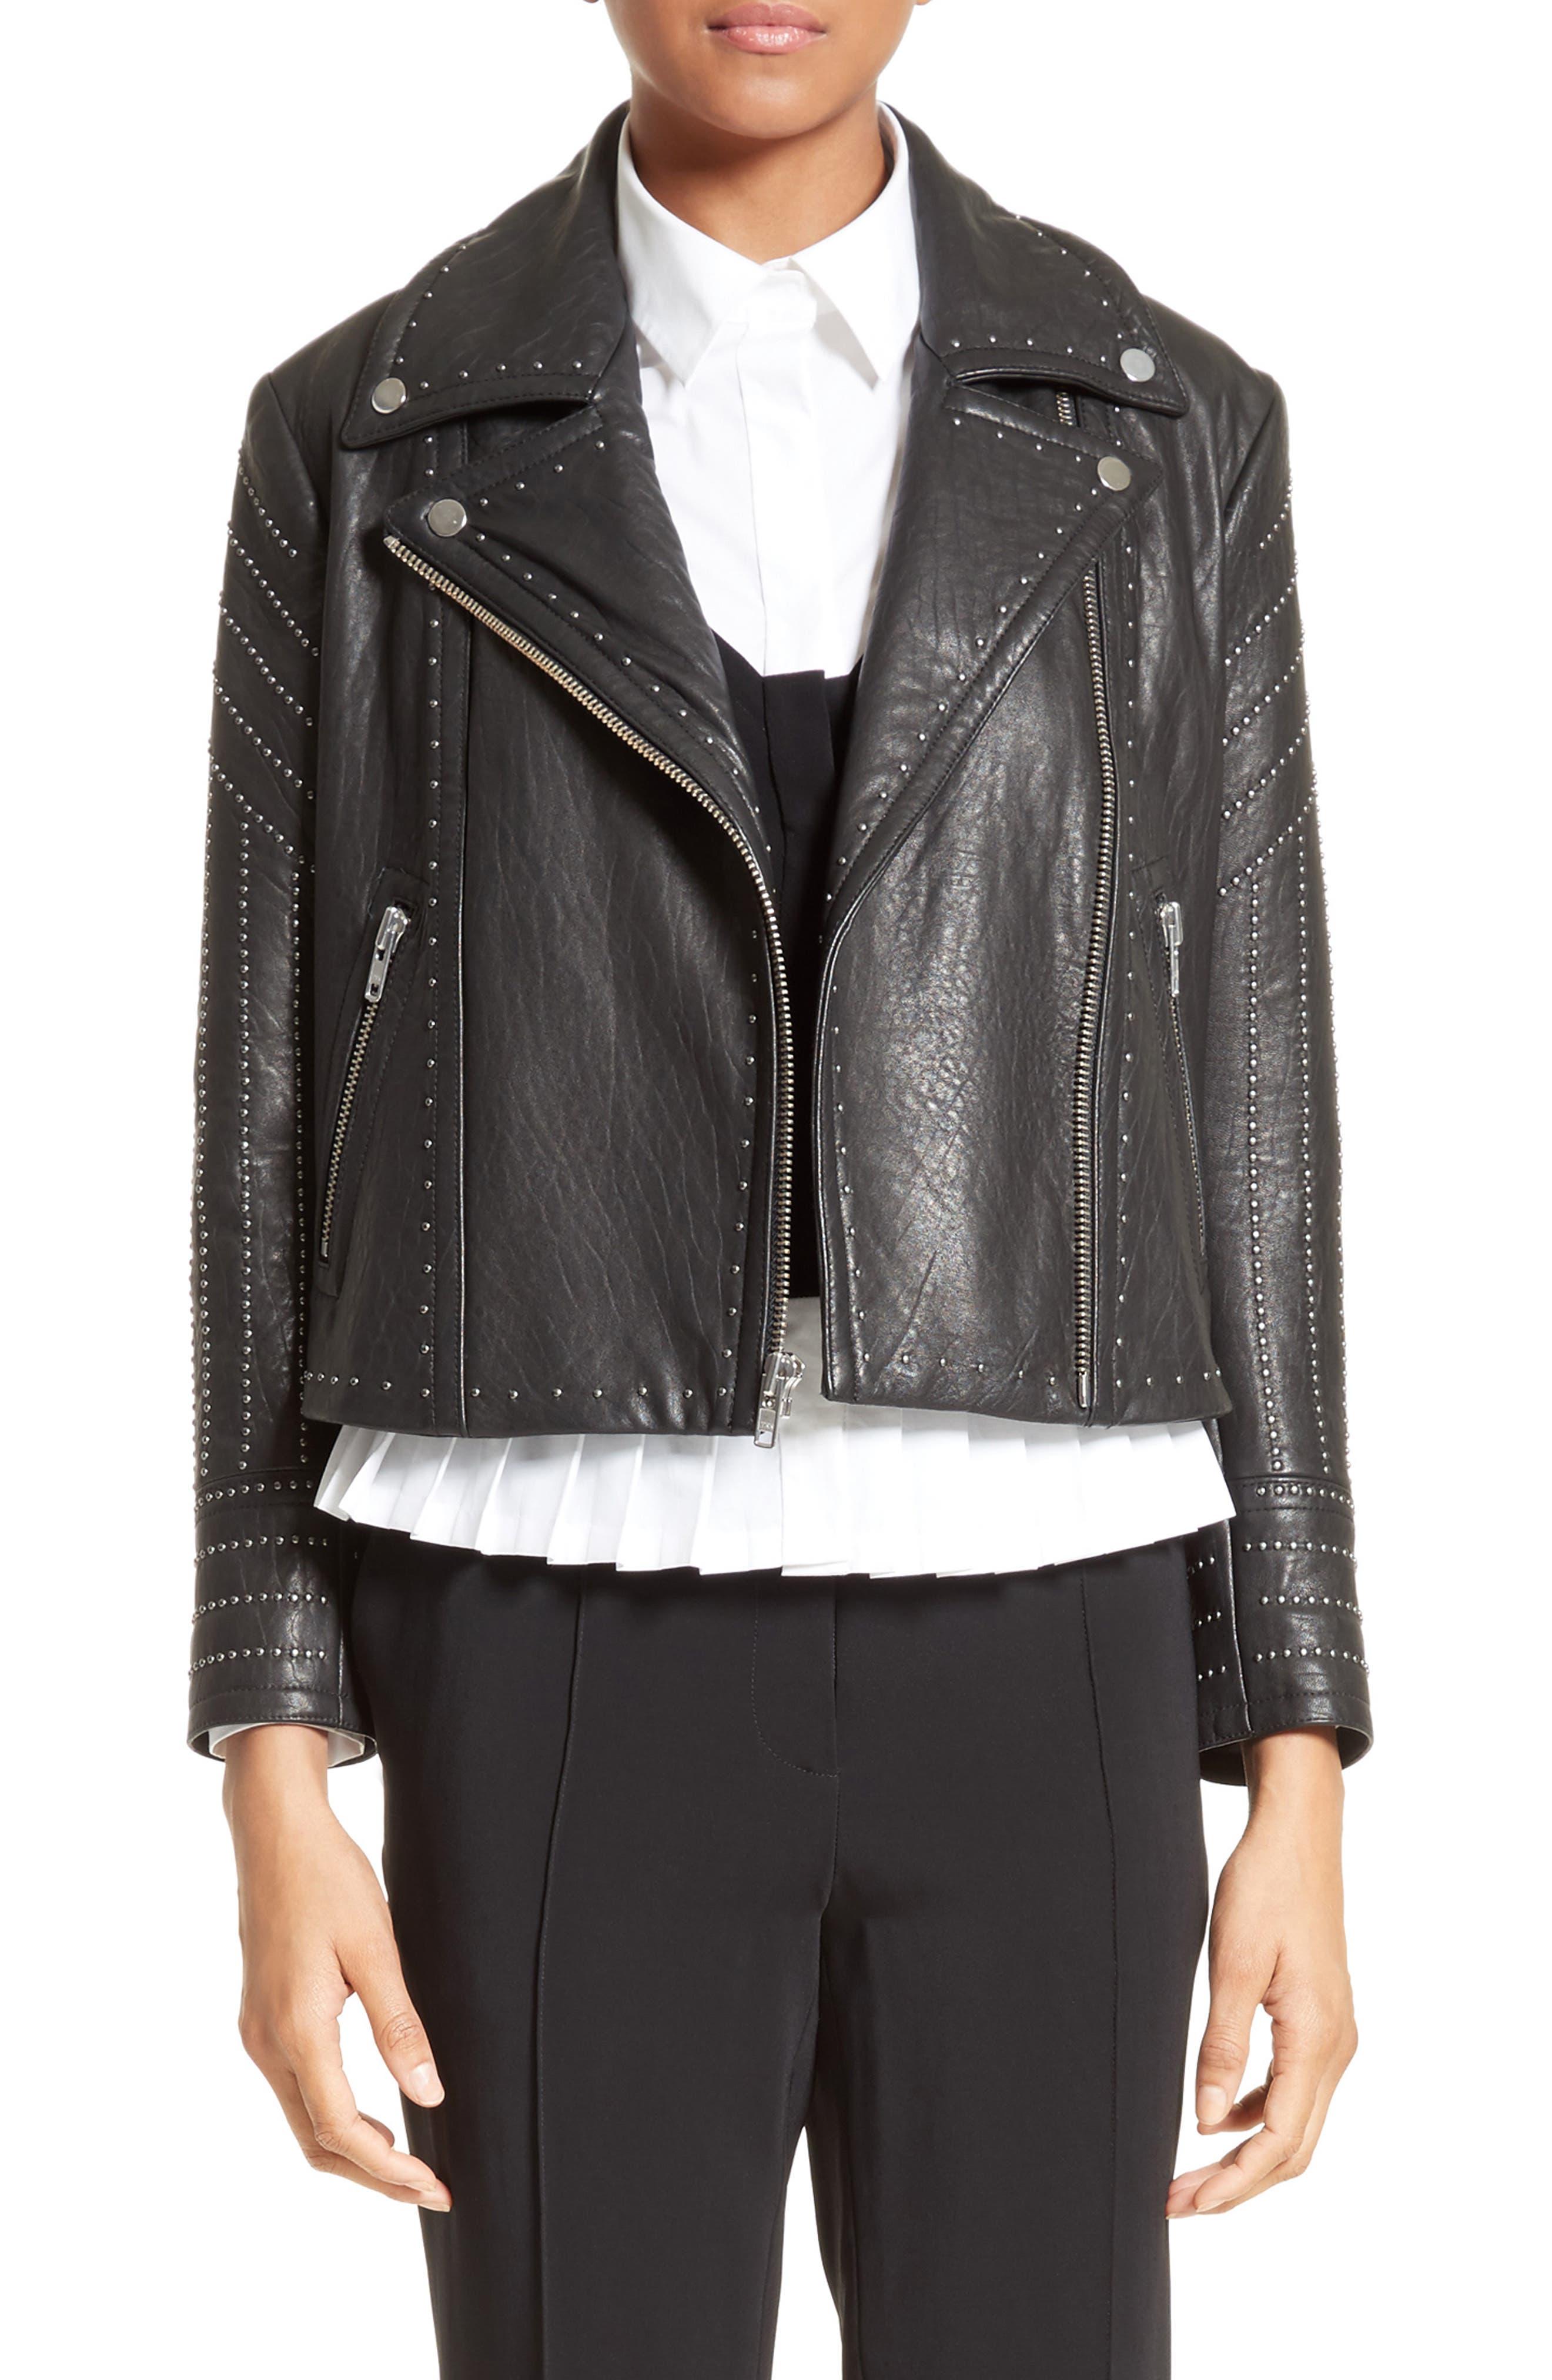 Main Image - Yigal Azrouël Studded Leather Jacket